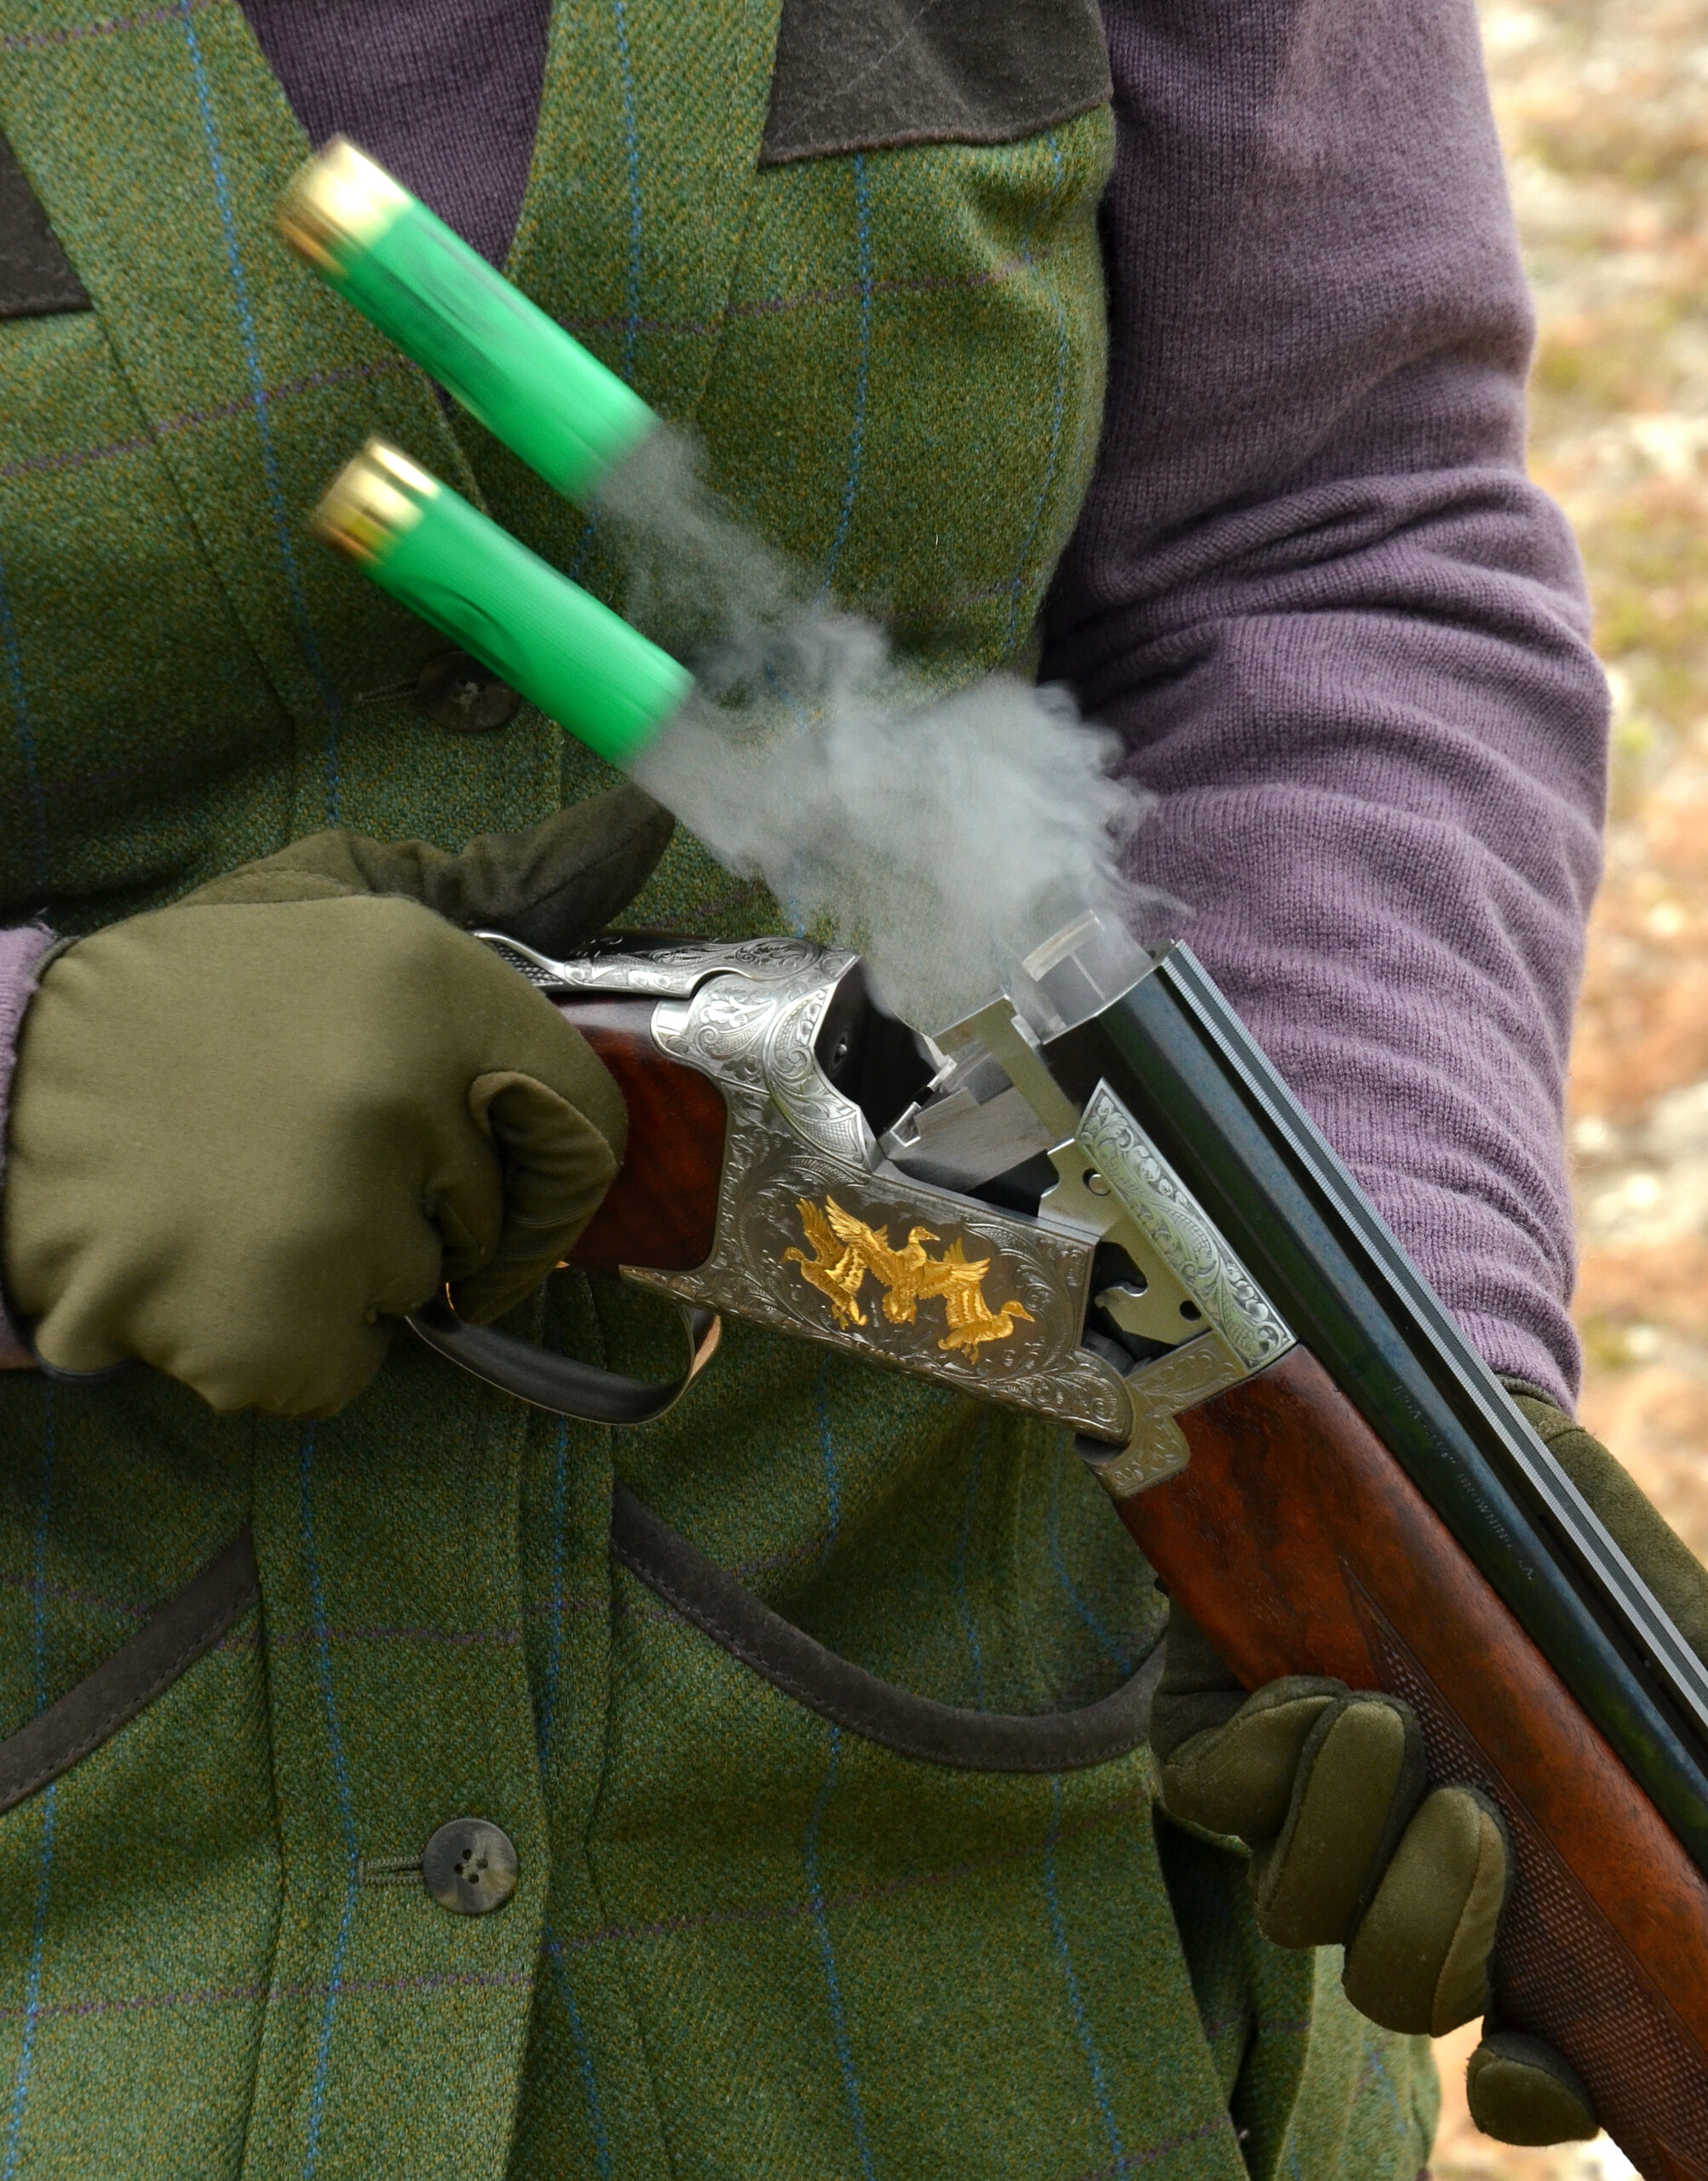 shotgun cartridges   shotgun and firearms applications and renewals medical reports   Shotgun Medicals